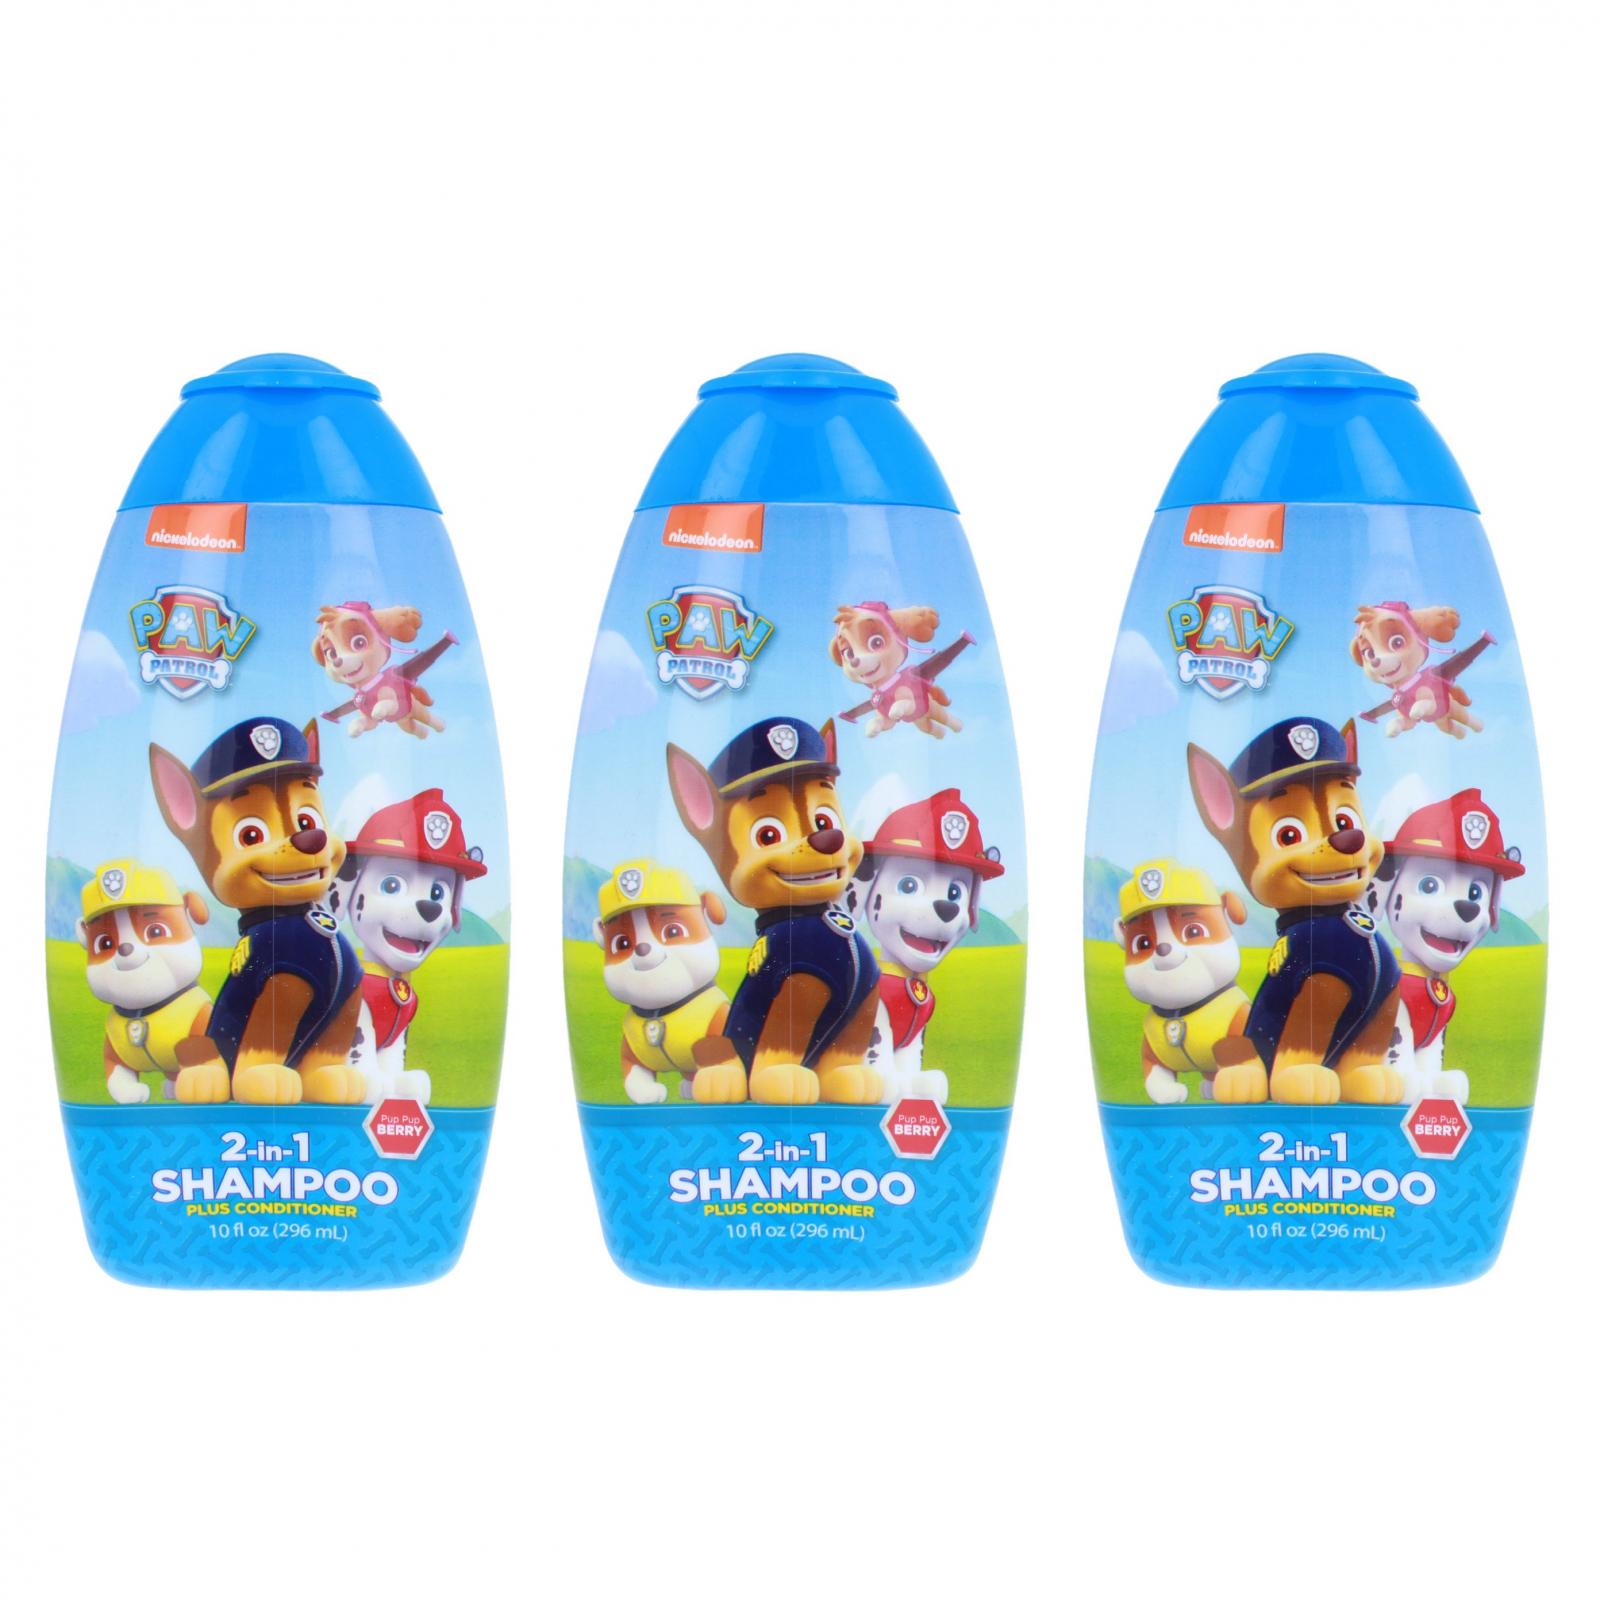 Paw Patrol Childrens 2 in 1 Shampoo Conditioner 10oz 3pk